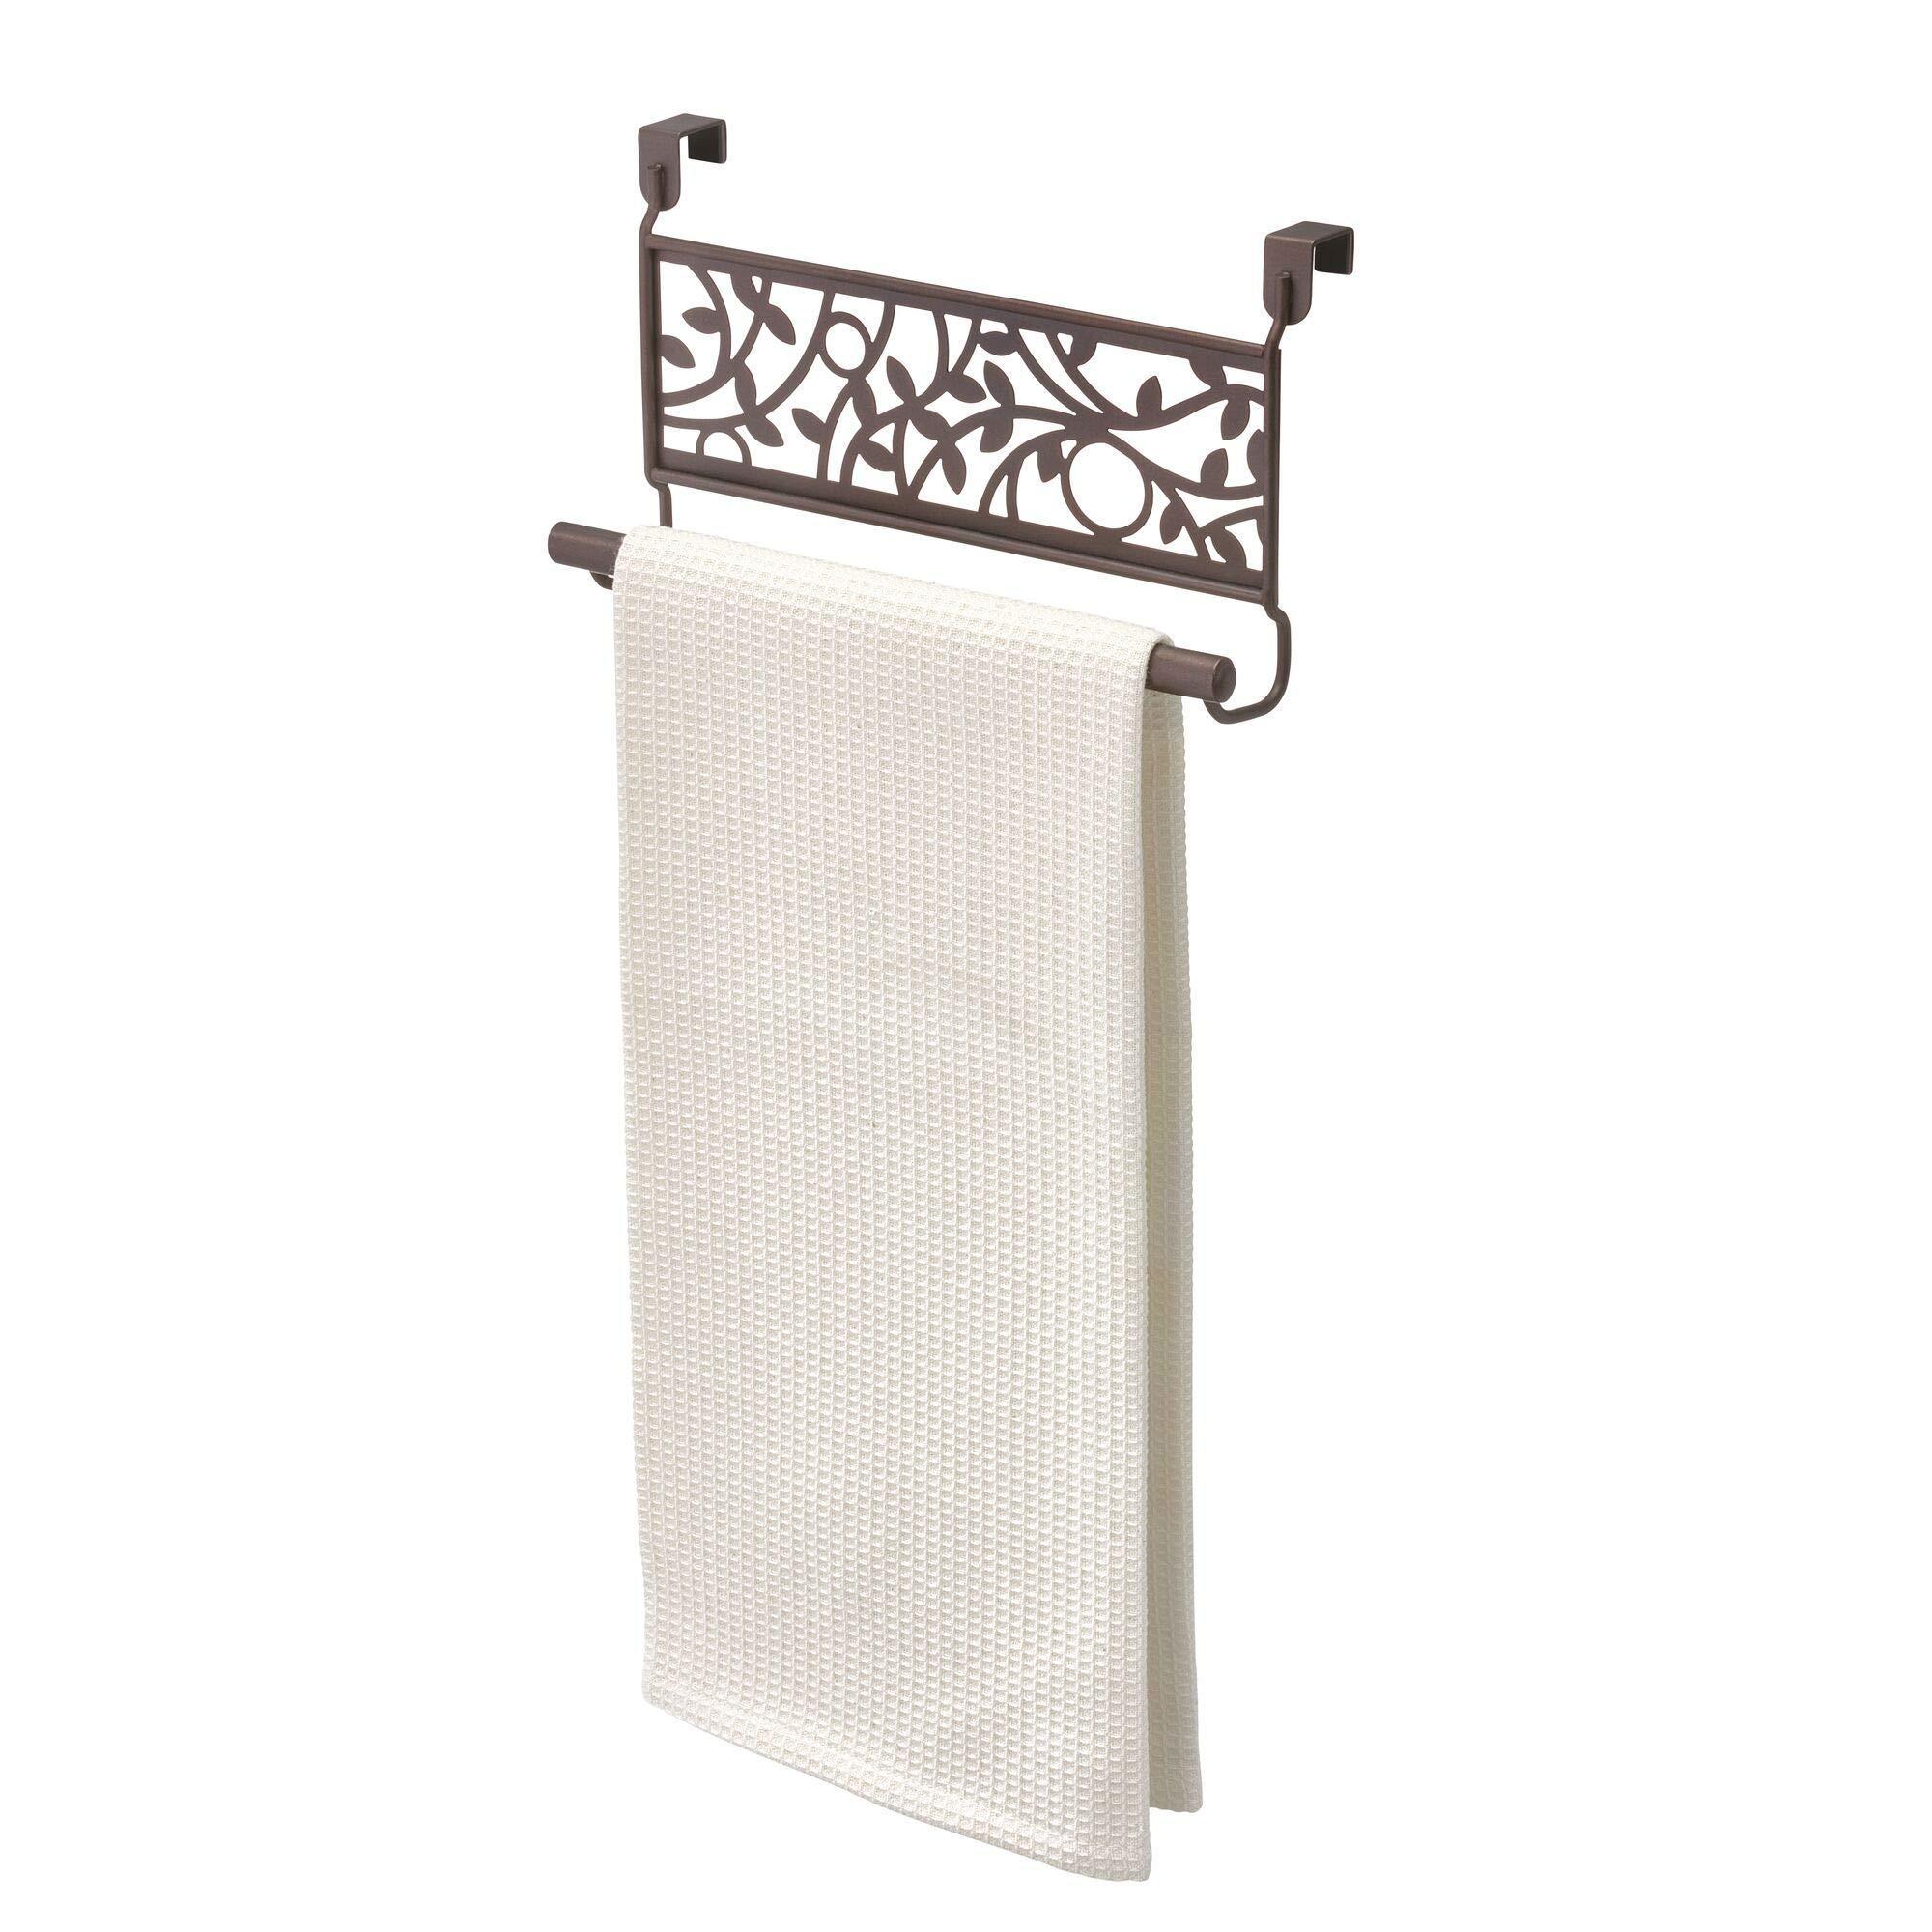 2 Metal Over The Counter Towel Bar ~ Bronze ~ New